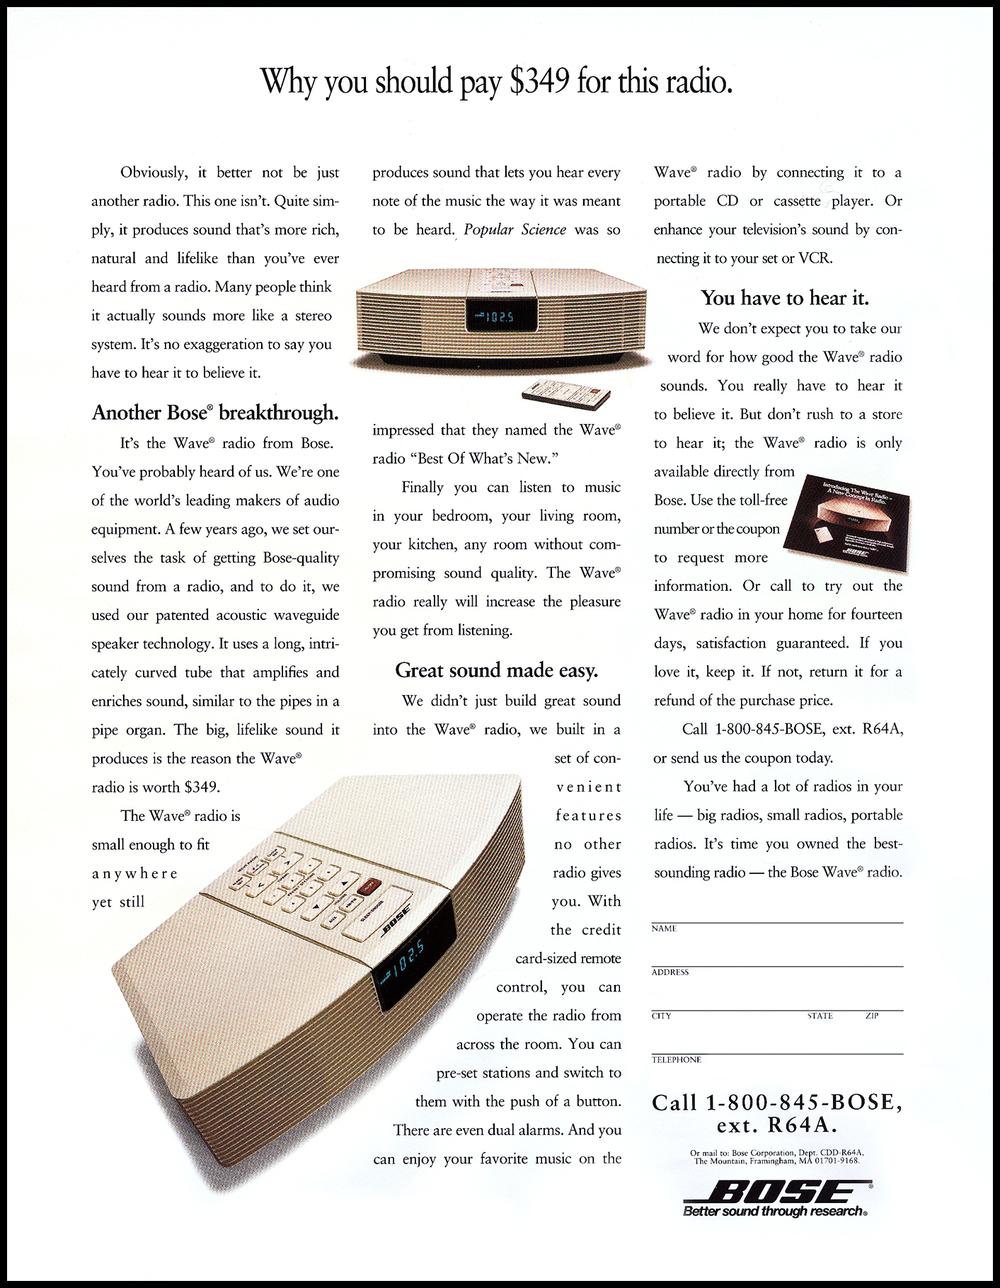 Bose.Print.Consumer.5.jpg